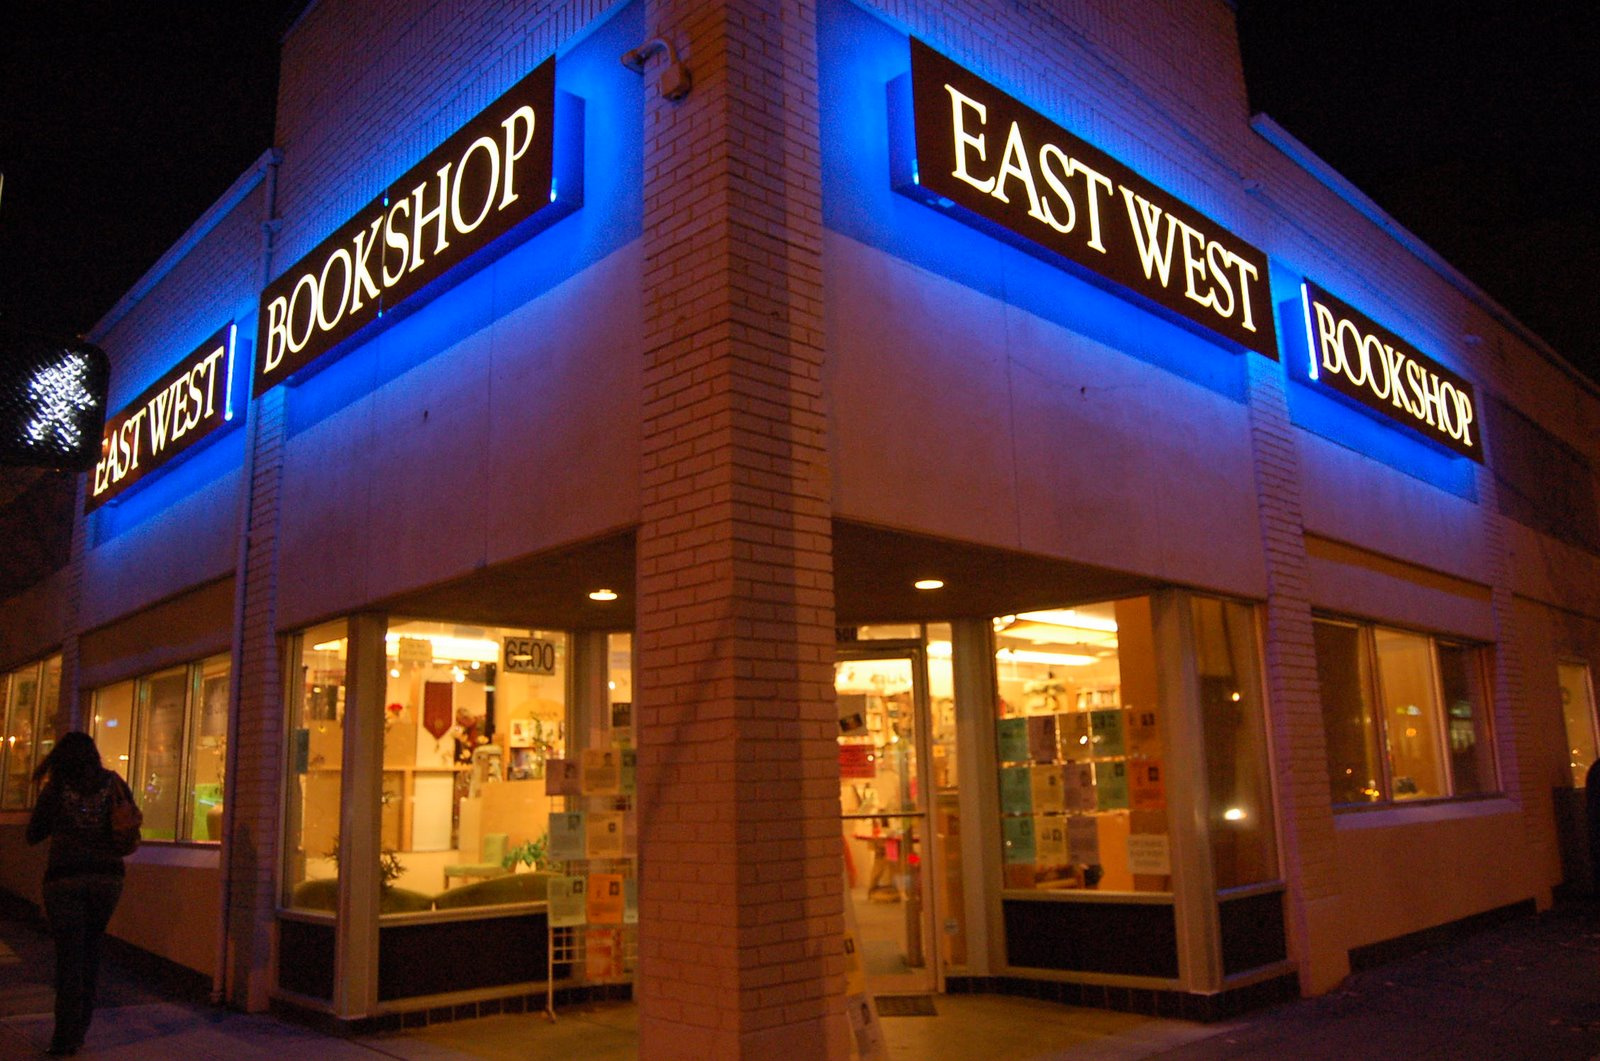 East West Bookshop Seattle exterior for Facebook